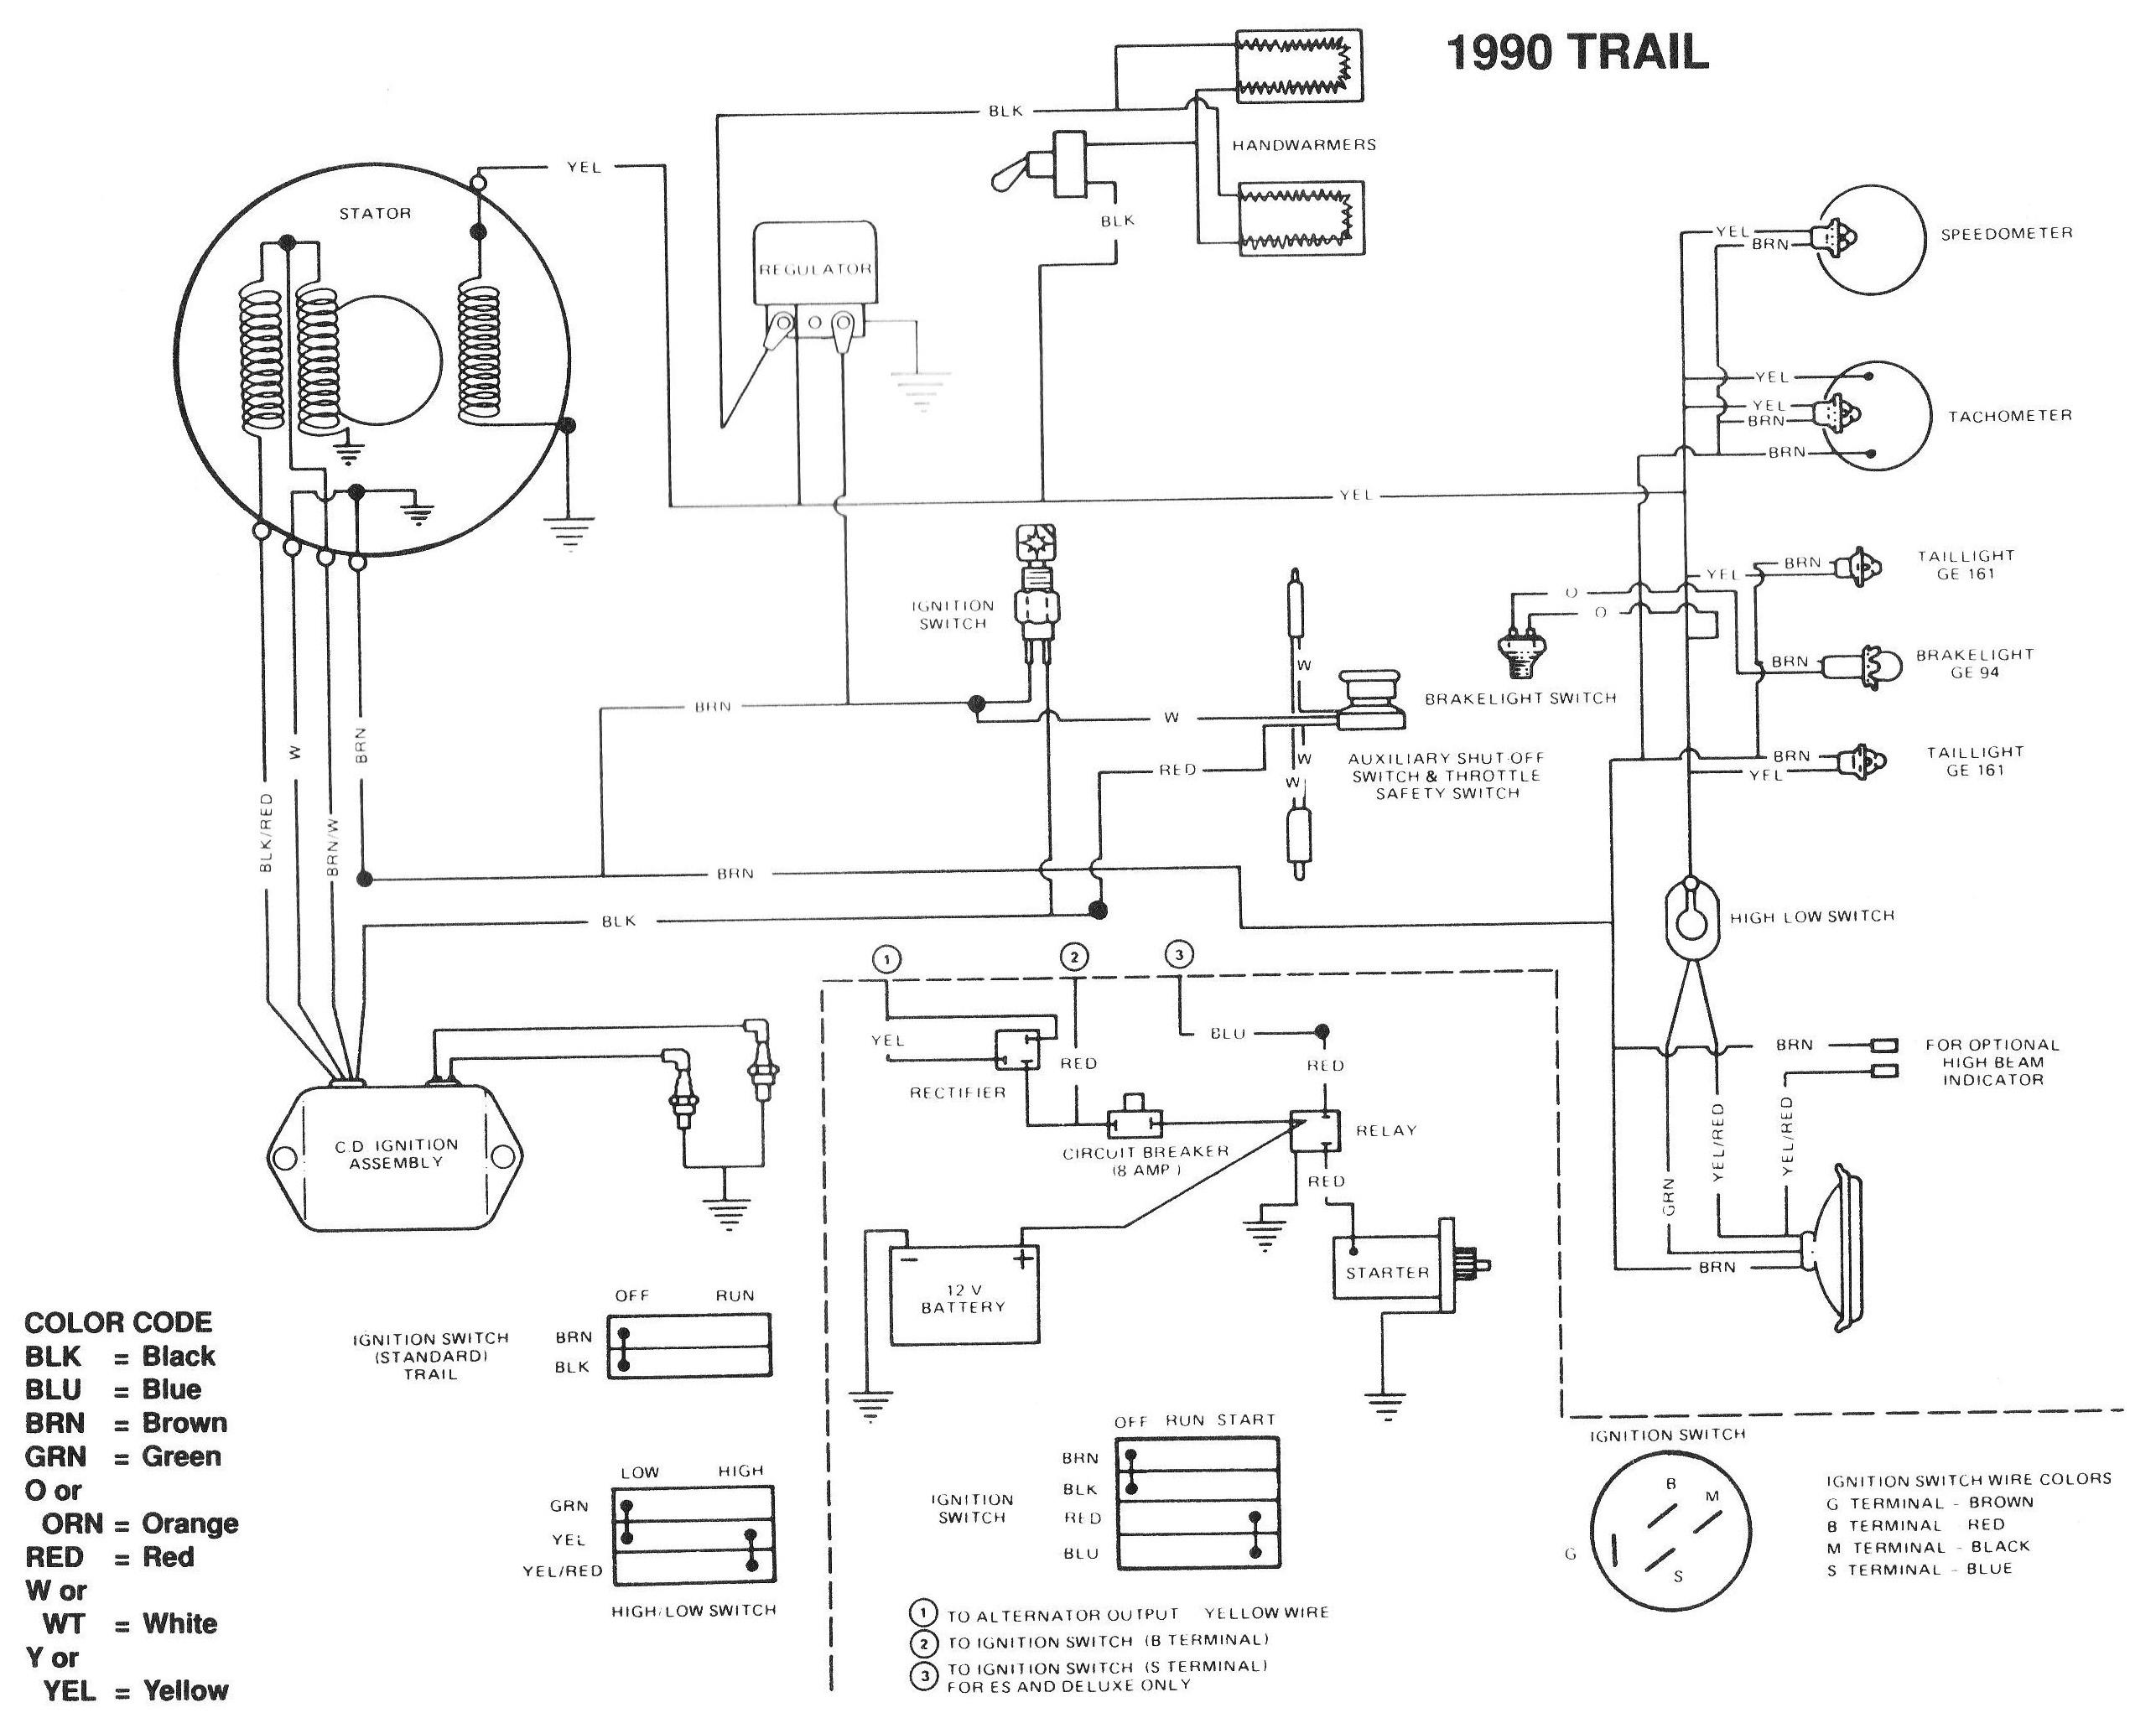 [DHAV_9290]  Indy Trail 488 fan Wire Diagram | Snowmobile Fanatics | 1999 Polaris Indy 700 Wire Diagram |  | Snowmobile Fanatics